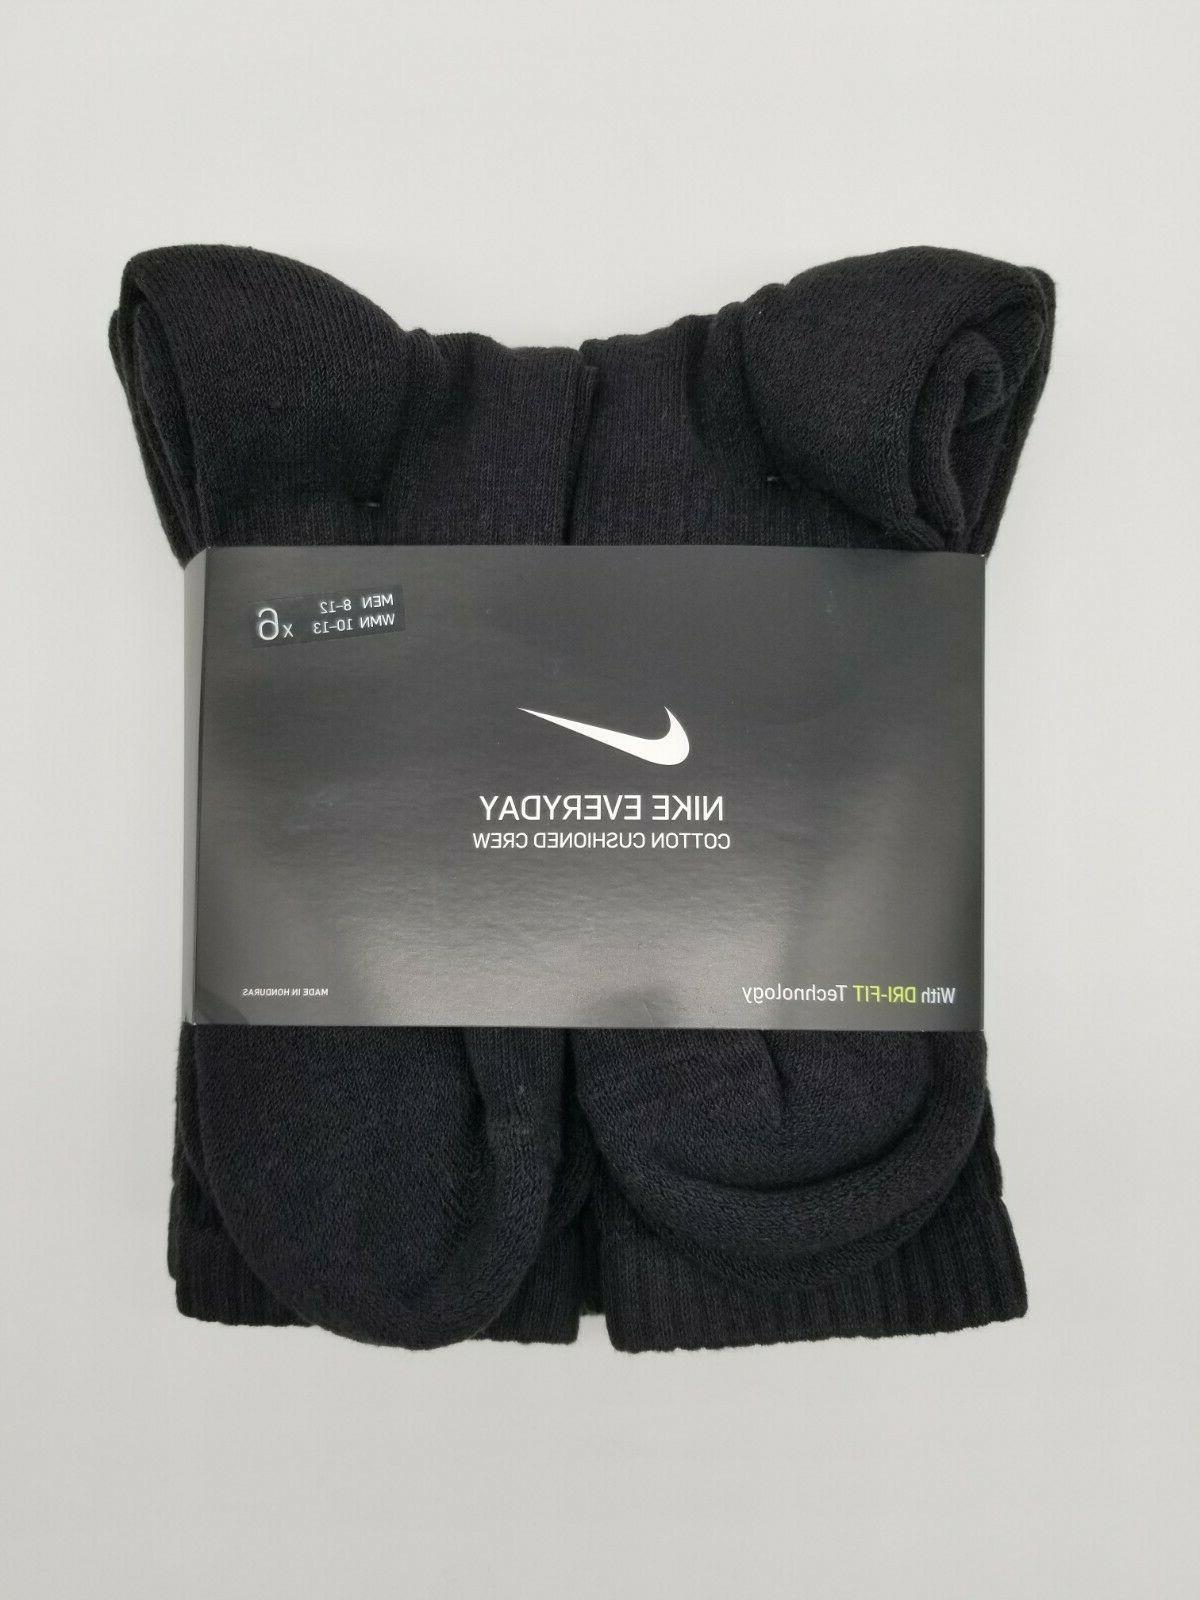 Nike 6 Pairs Cotton Cushioned Socks Size Black